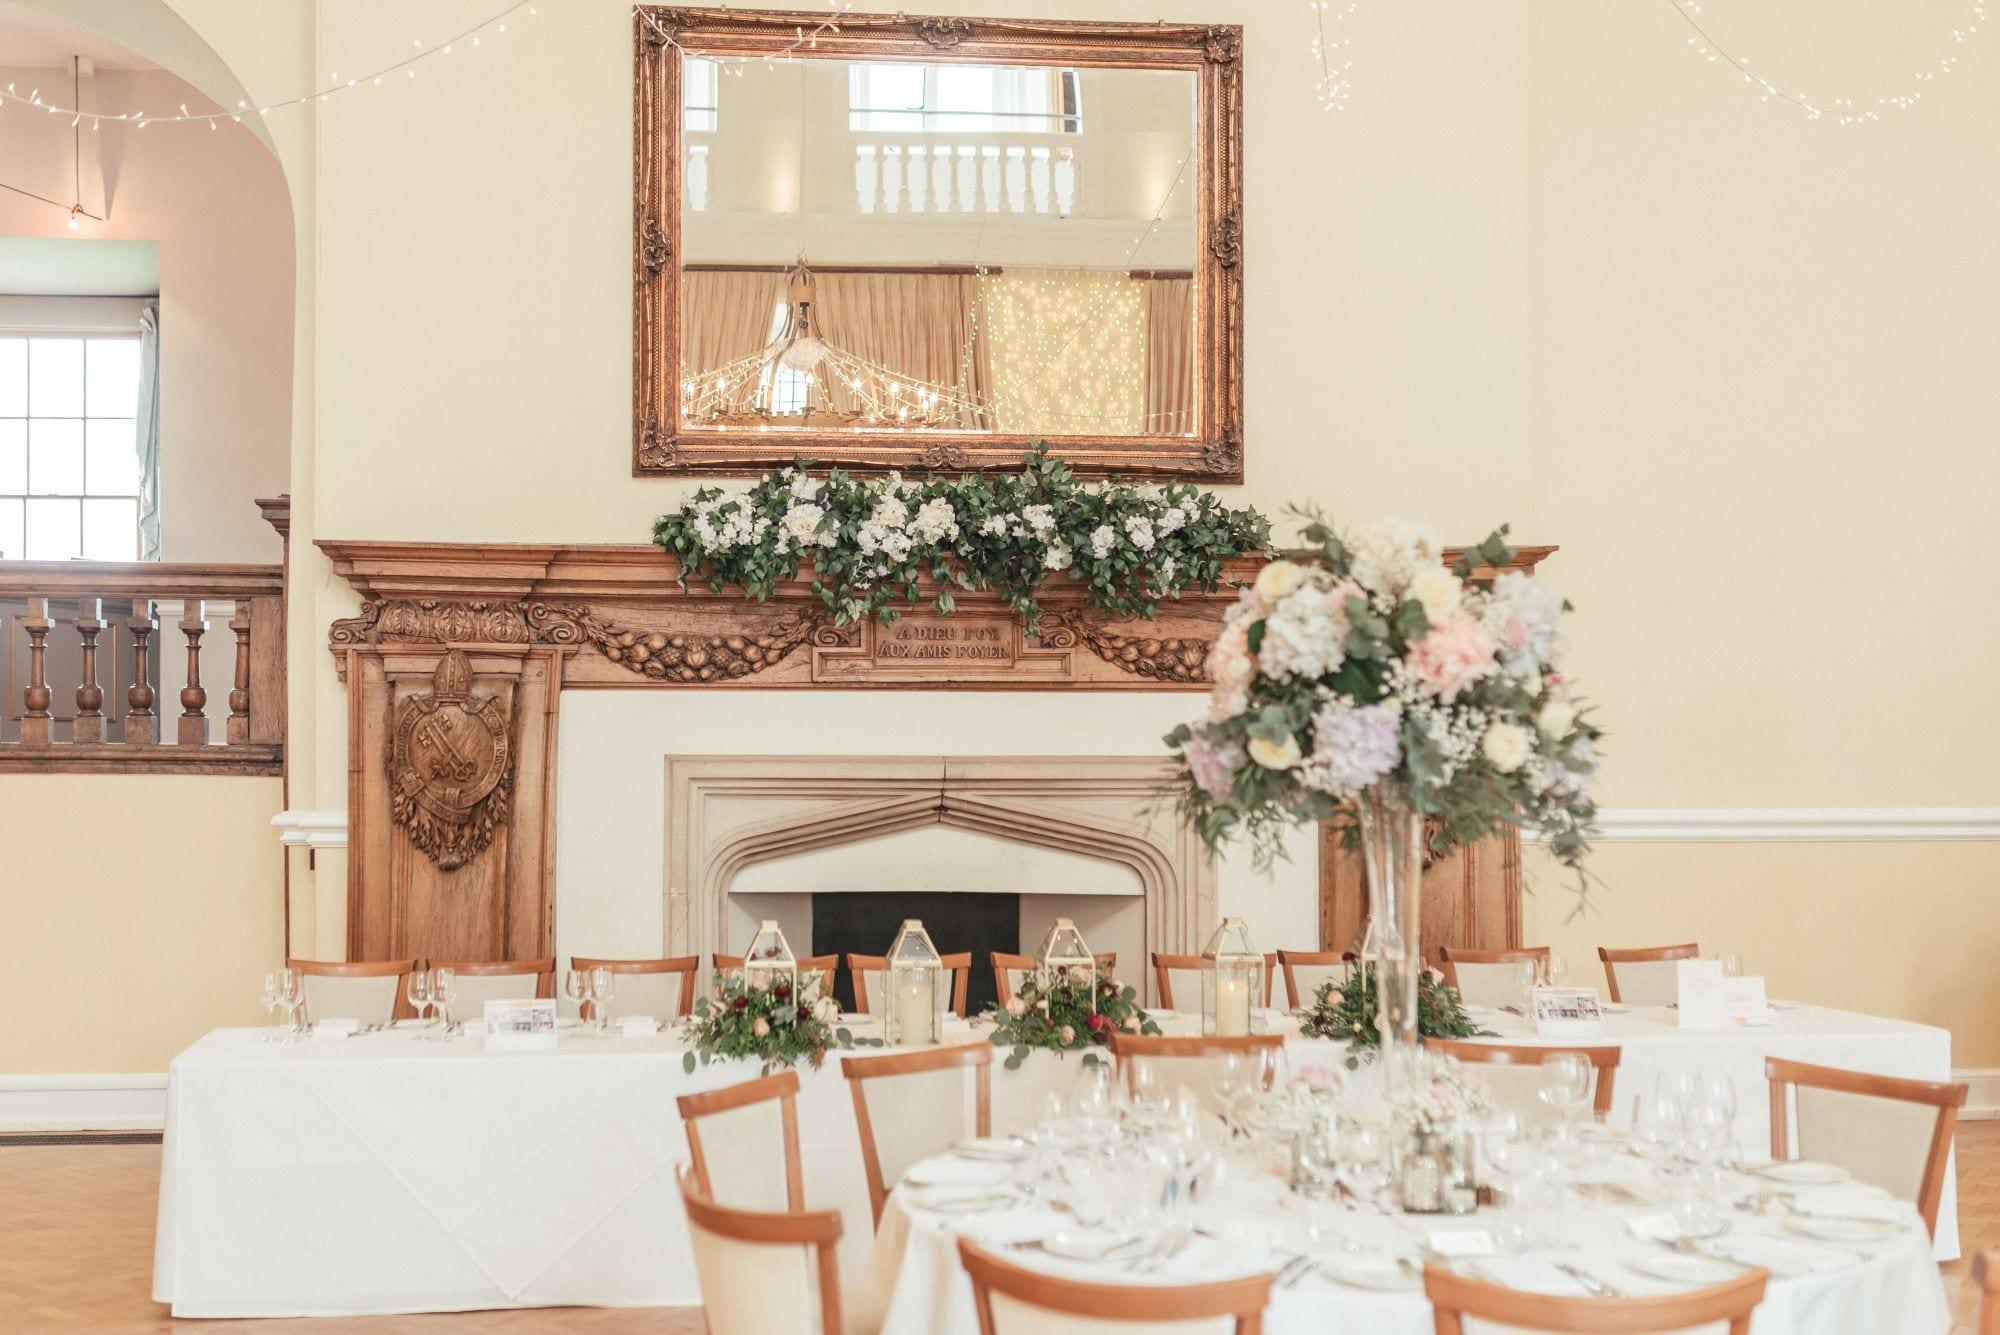 Small wedding receptions at Farnham Castle